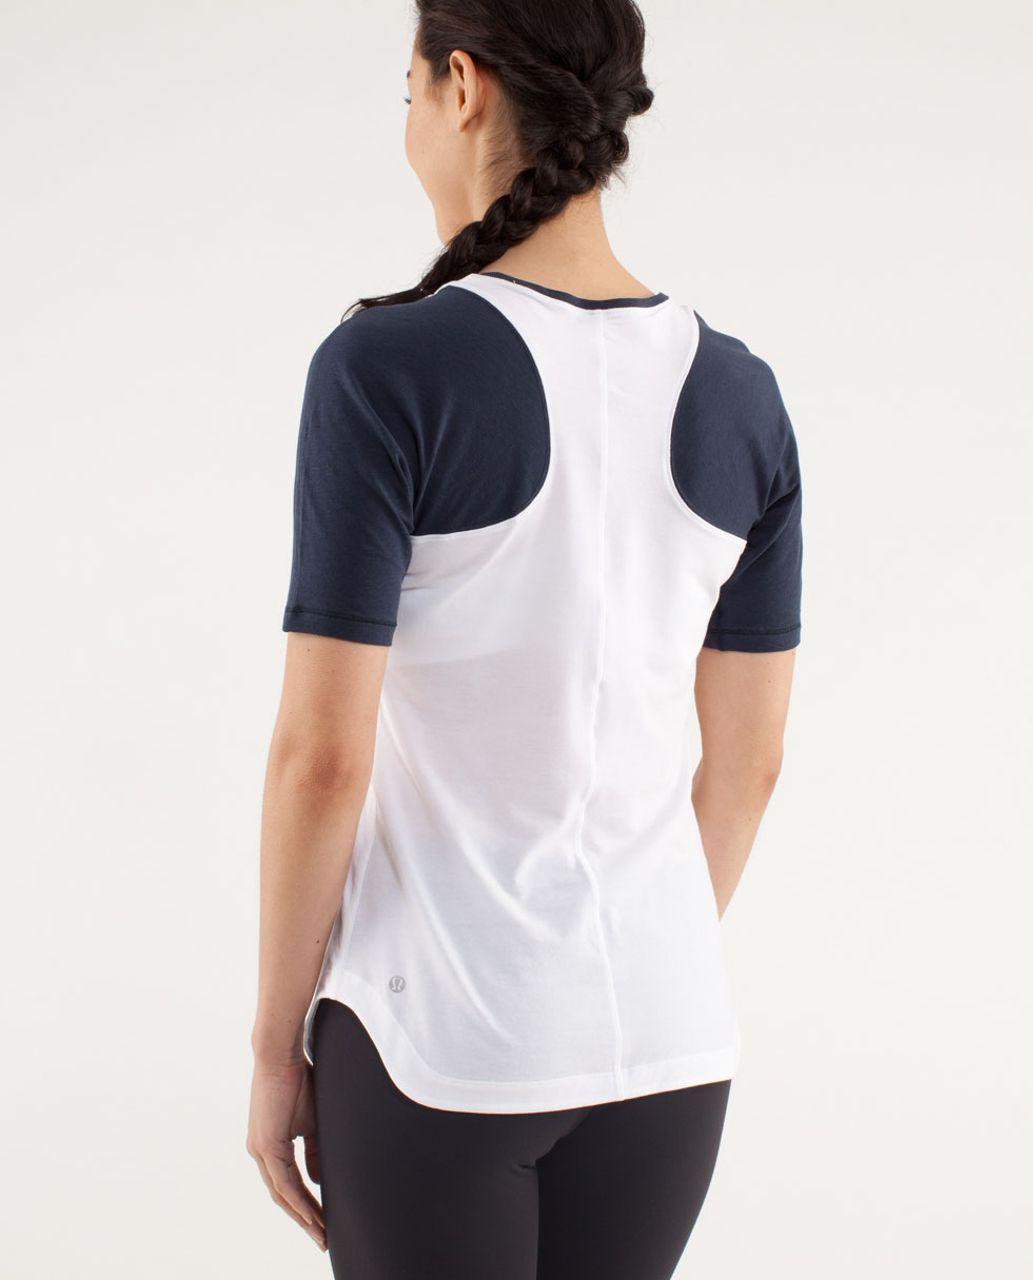 Lululemon Clari-Tee Short Sleeve - White / Inkwell